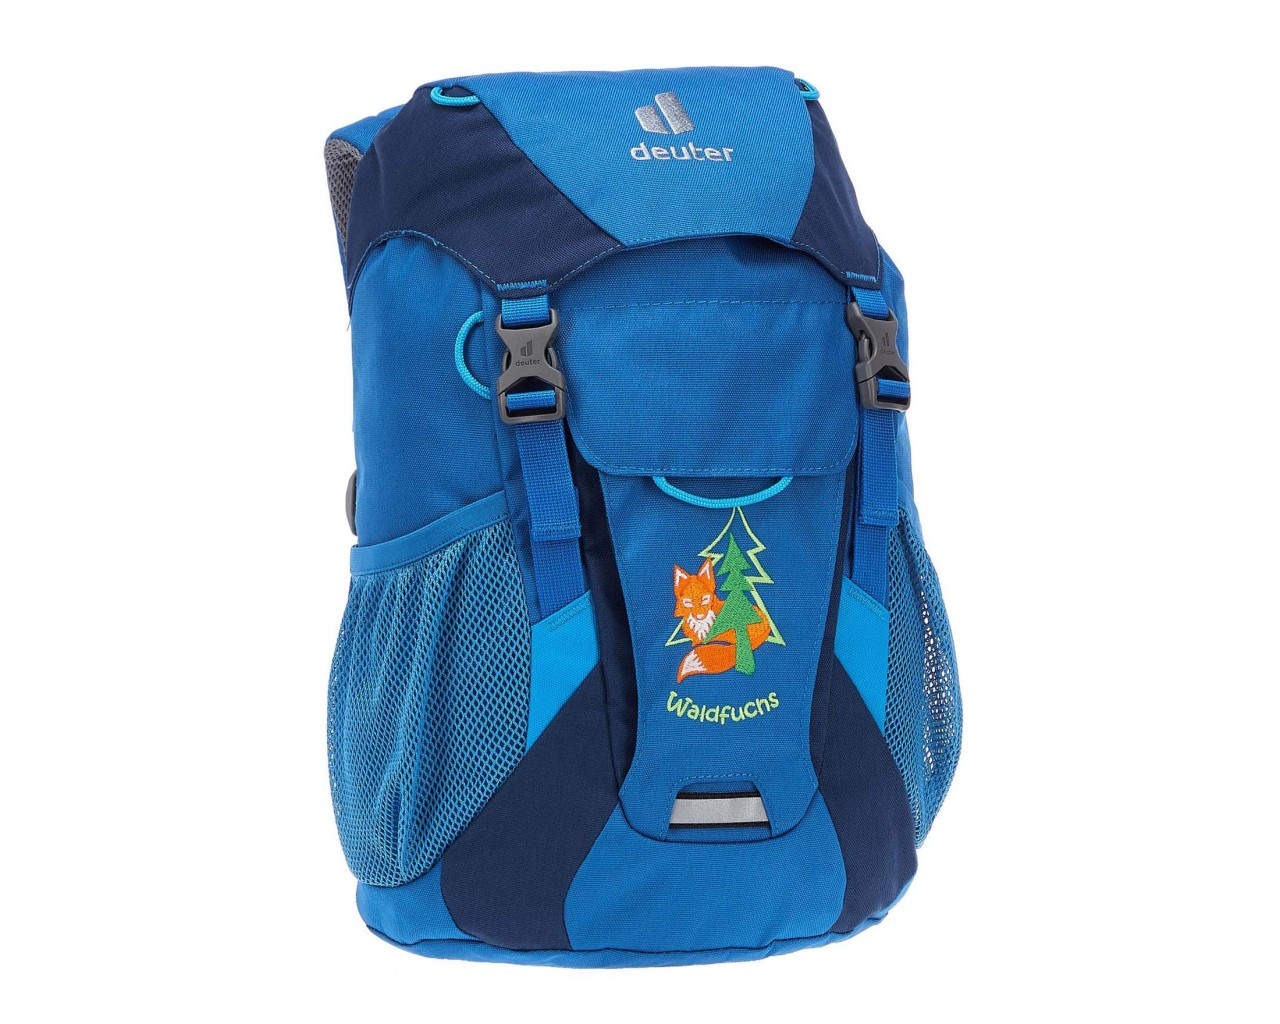 Deuter Waldfuchs 10 litres Kids backpack PFC-free   bay-midnight